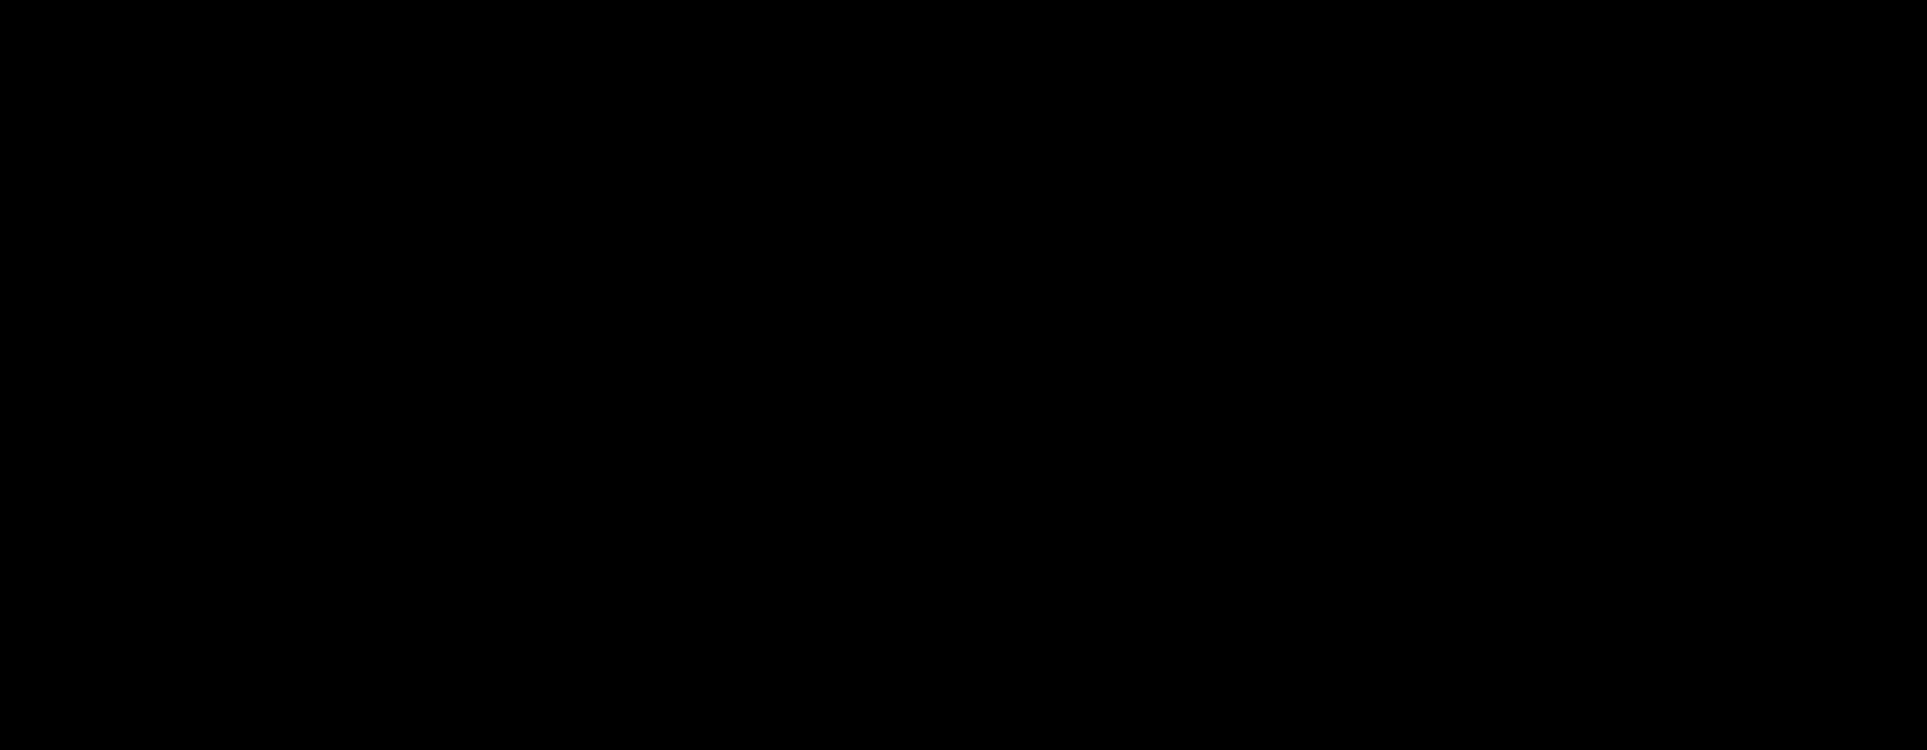 Reptile,Heloderma,Vertebrate